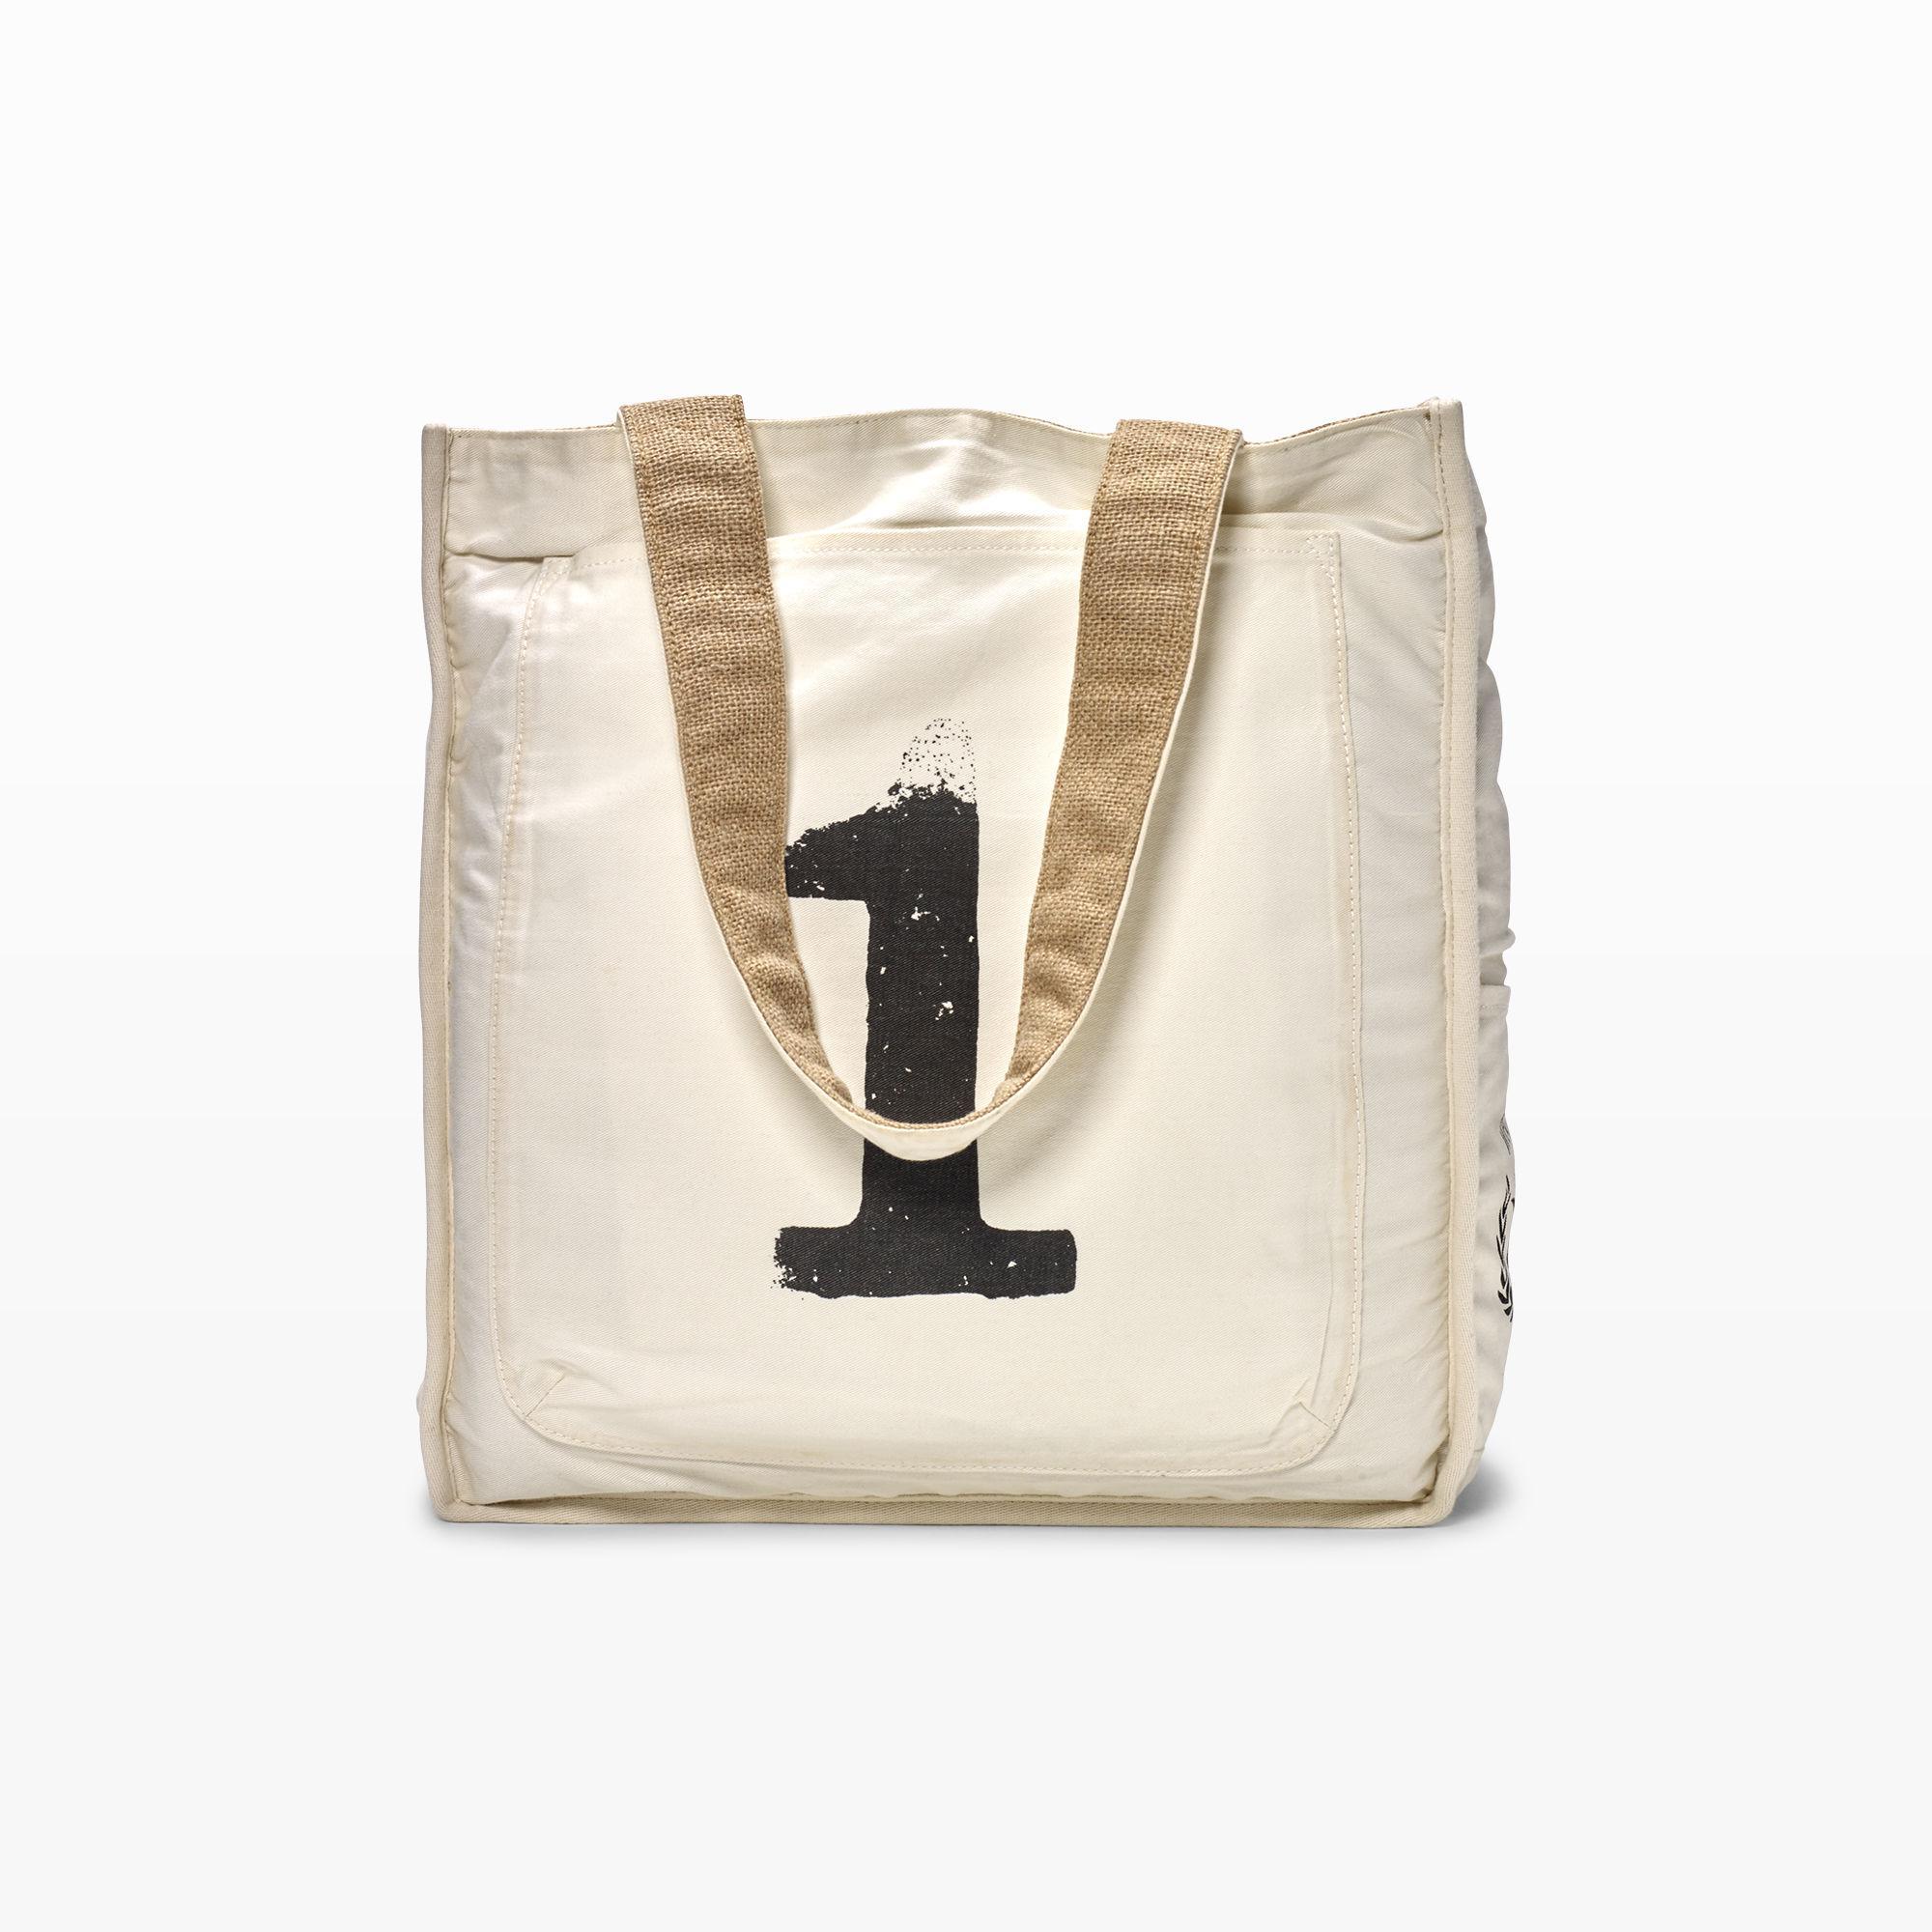 ed53a1475f3 Lyst - Club Monaco Feed 1 Shopper Tote Bag in Natural